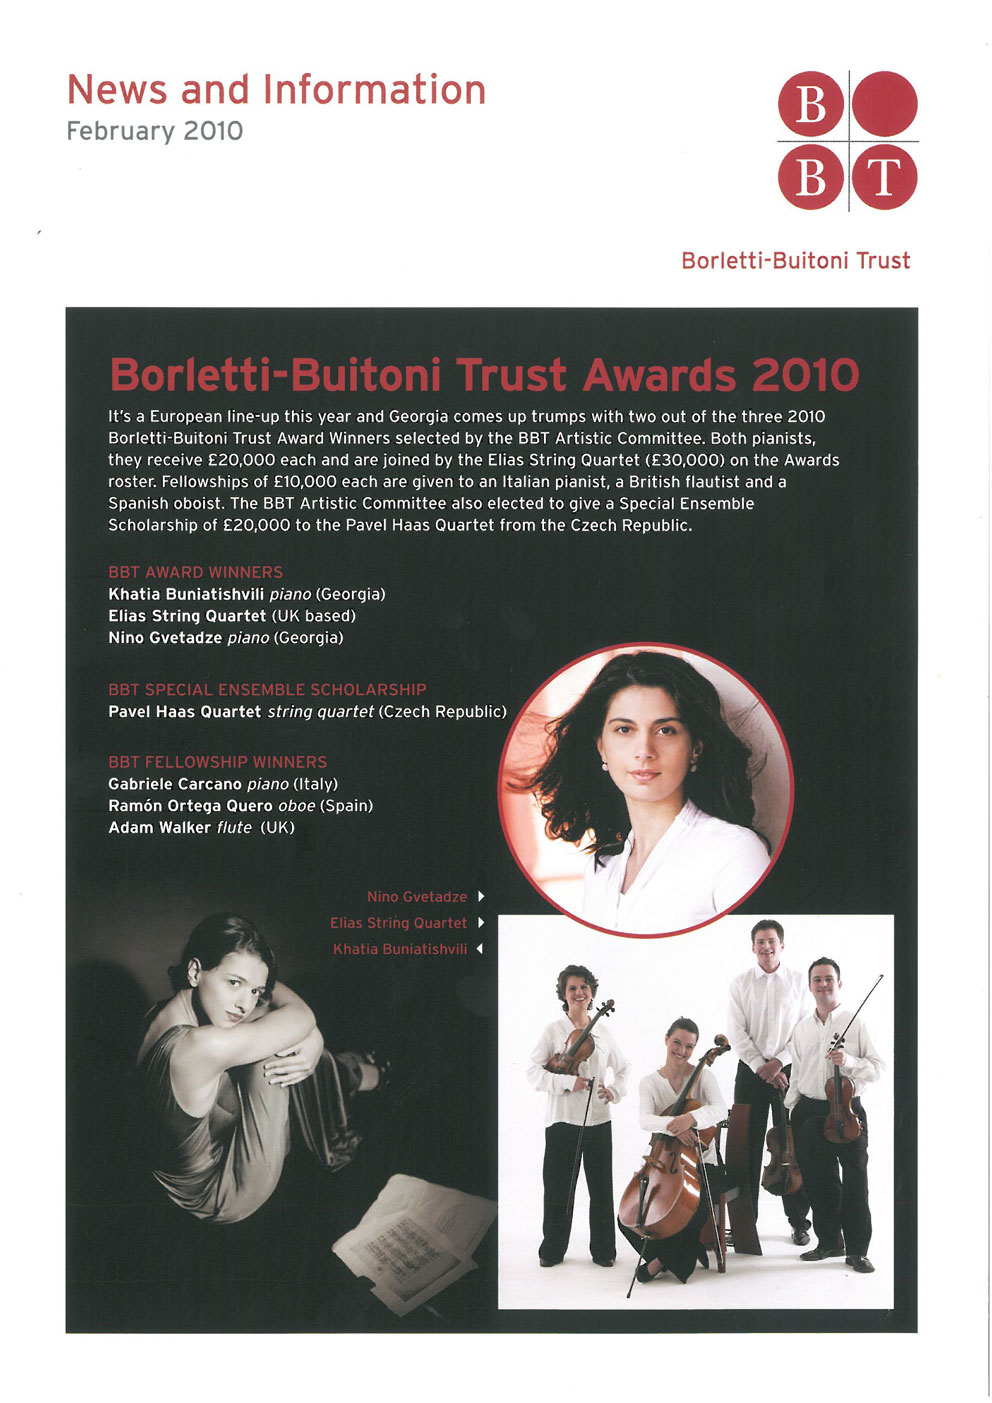 News, 2010, Borletti-Buitoni Trust